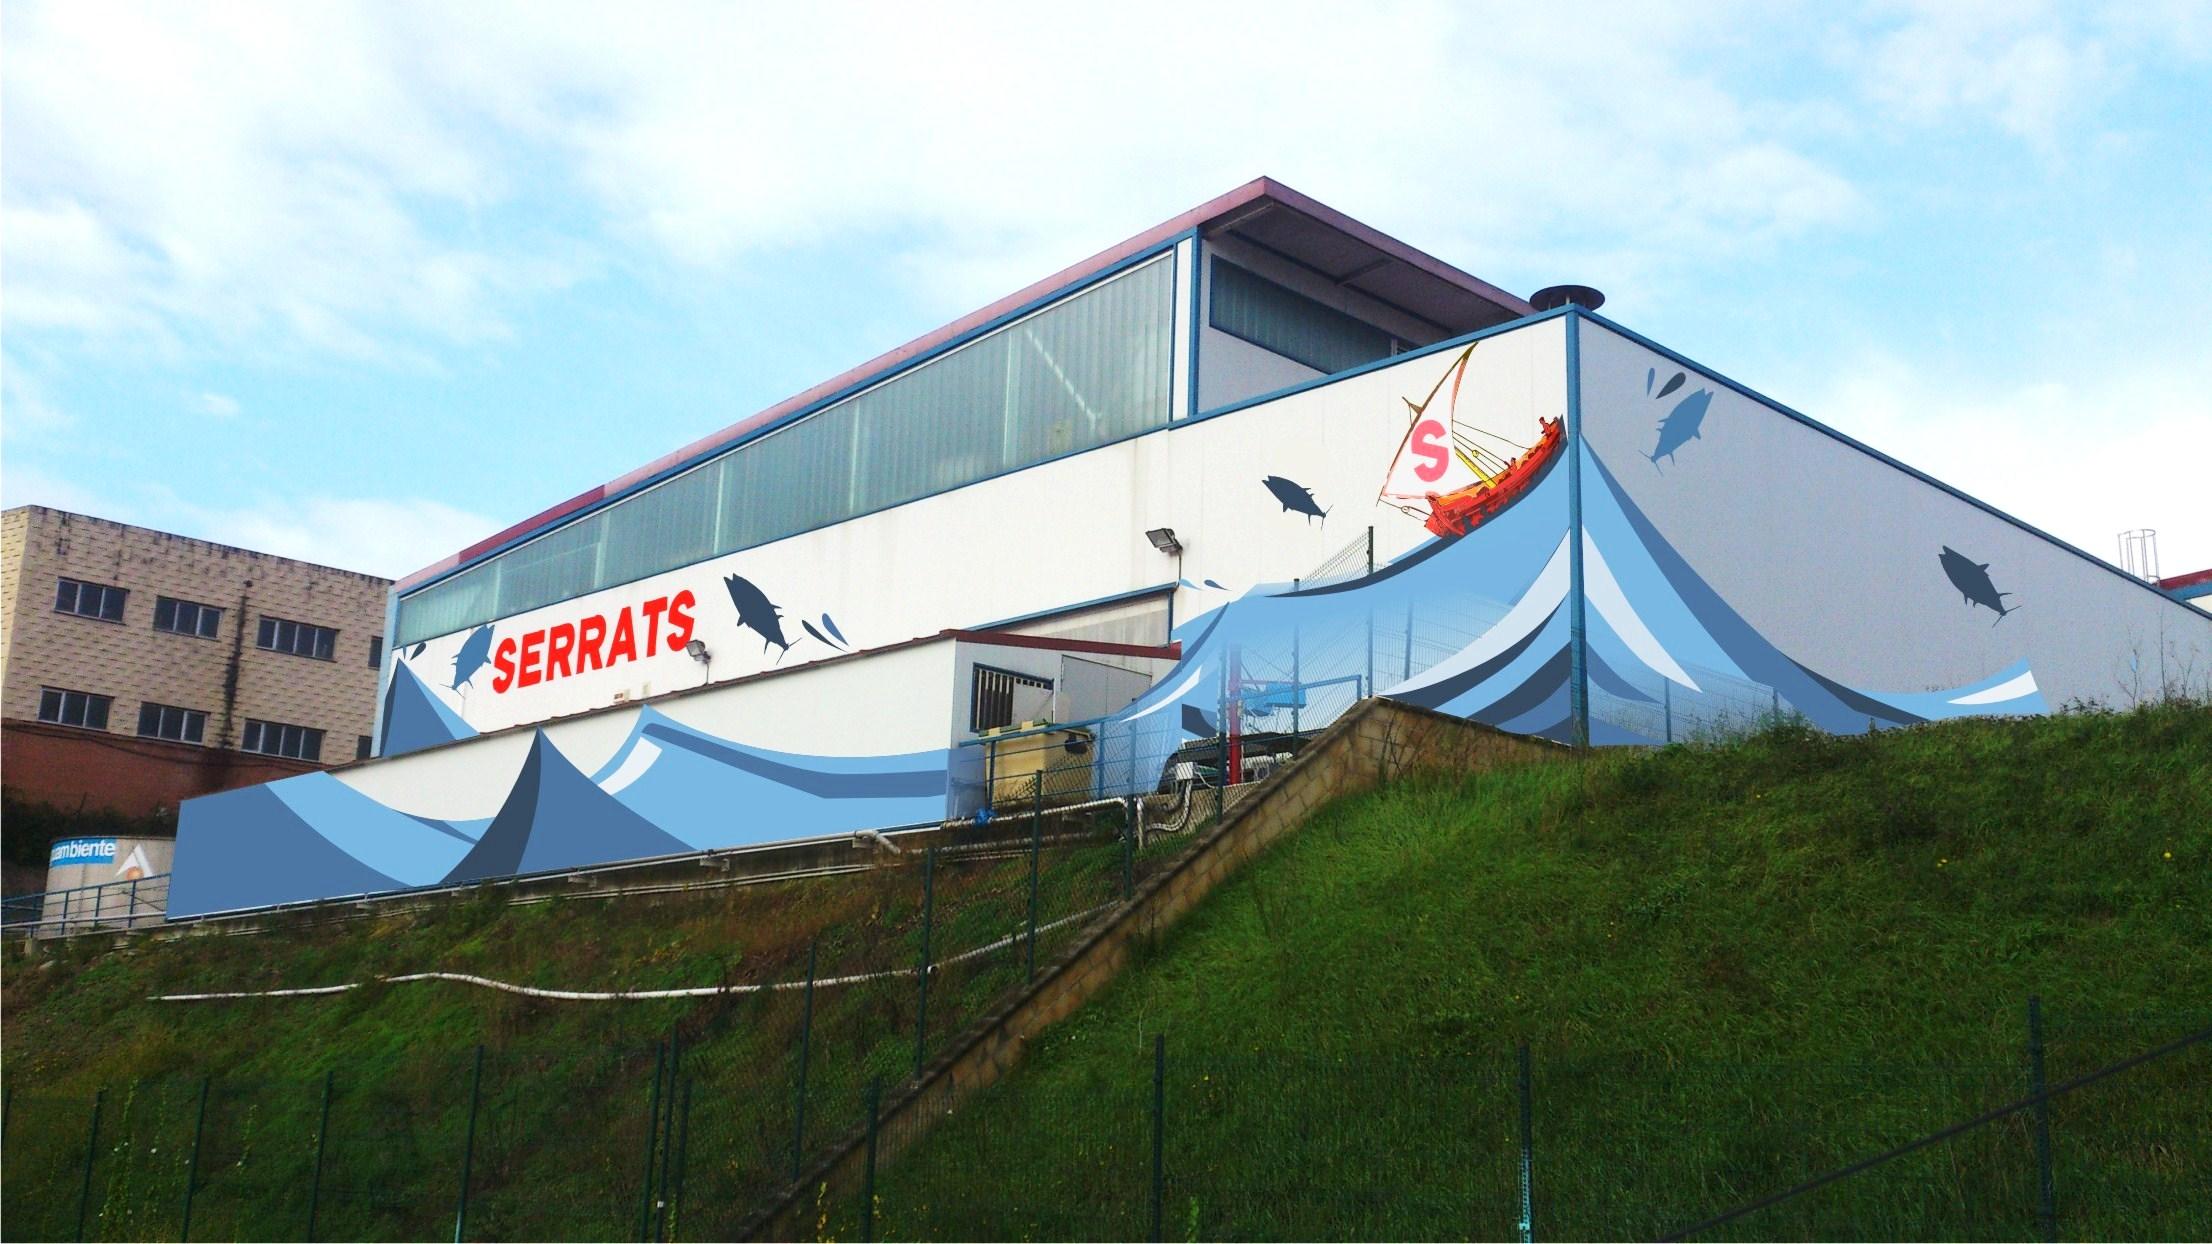 serrats_conservas_pescado_fabrica_exterior fábrica